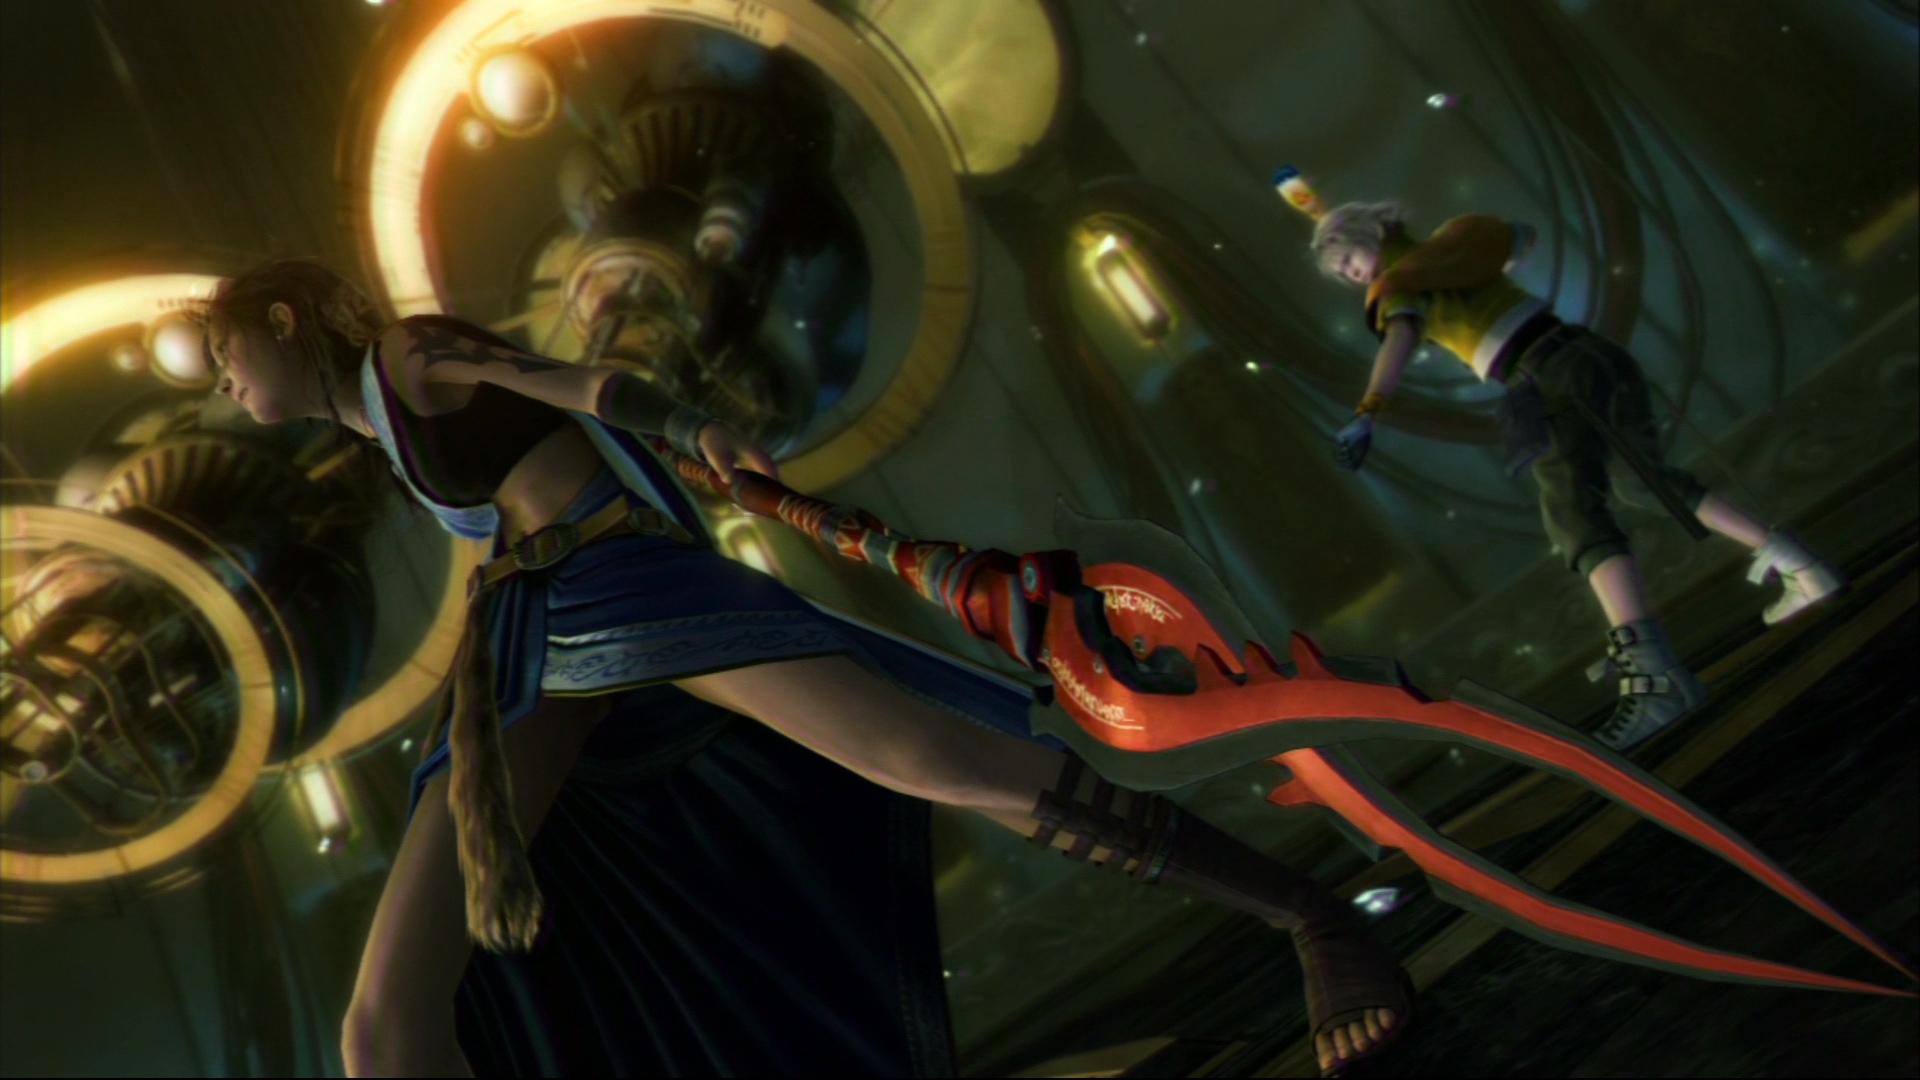 Wallpapers, fond d'ecran pour Final Fantasy XIII PC, PS3 ...